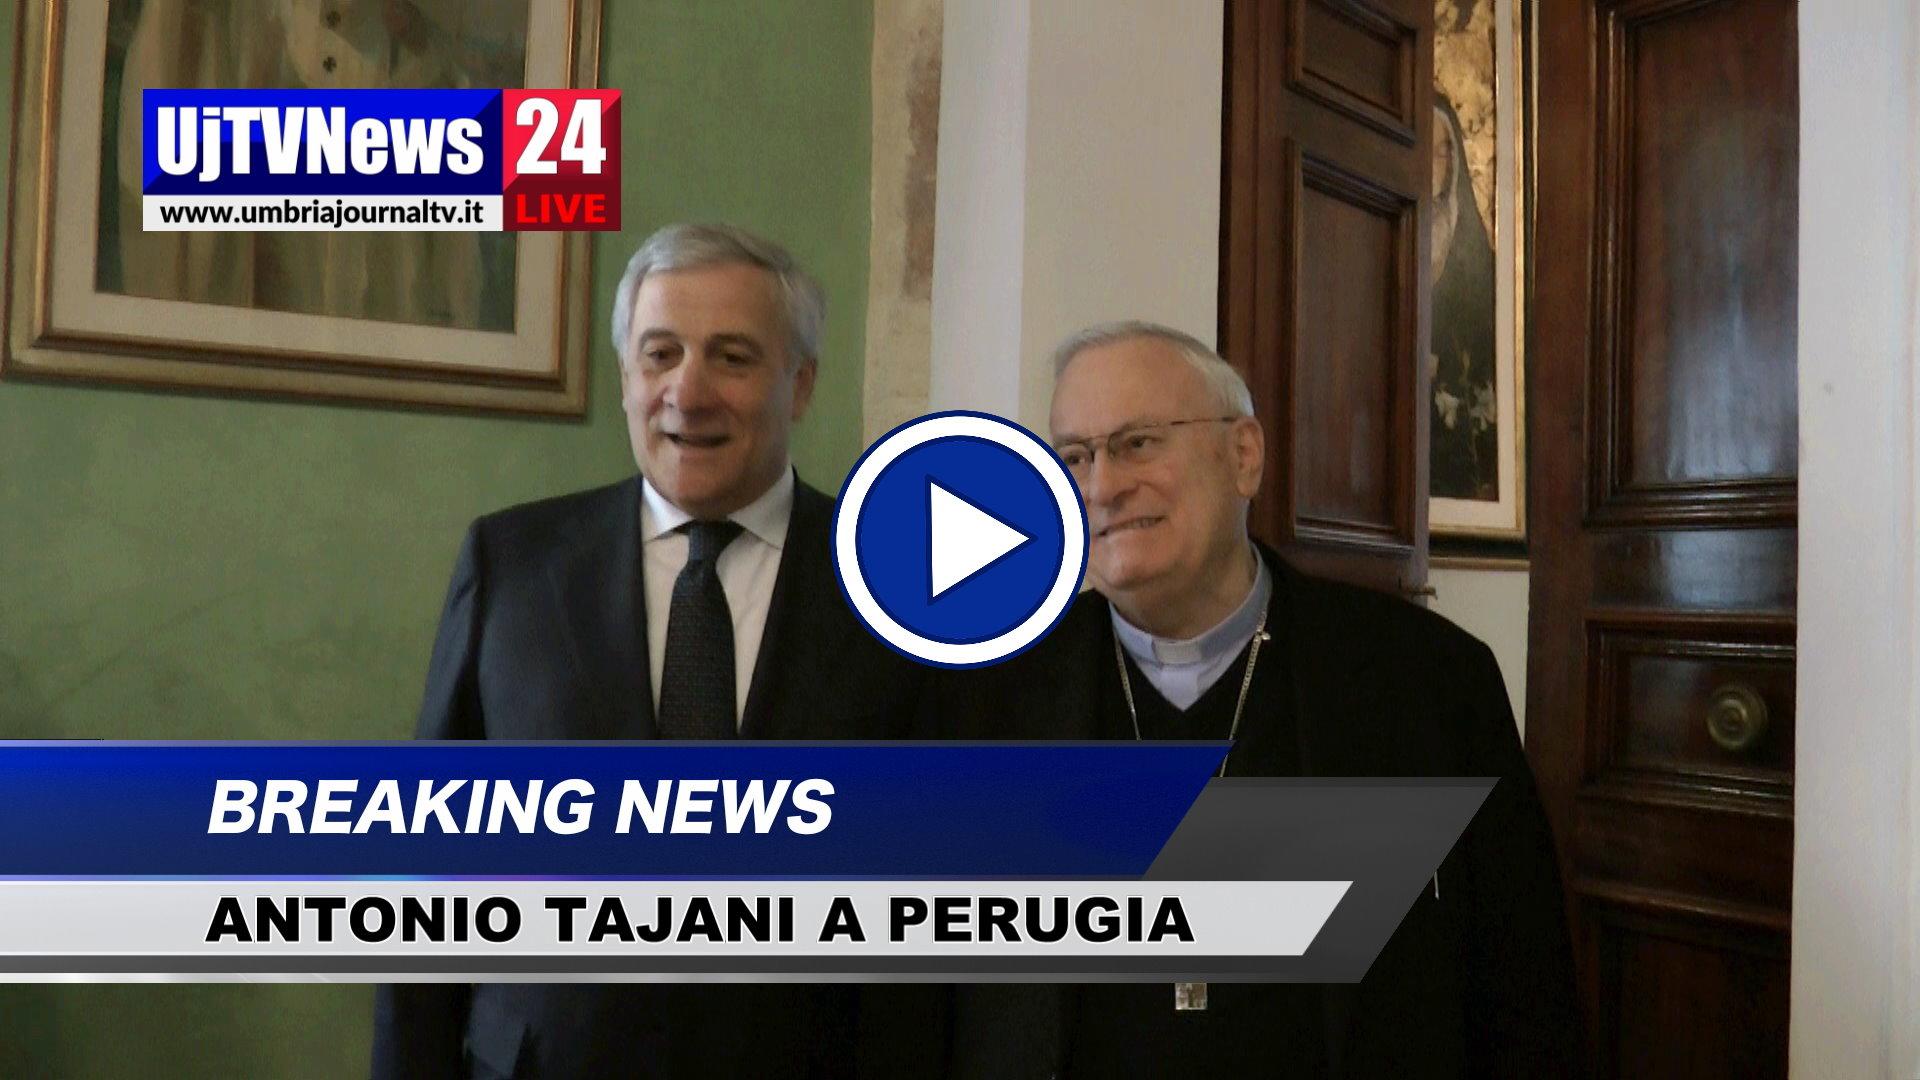 Antonio Tajani a Perugia incontra Cardinale Bassetti e sindaco Romizi